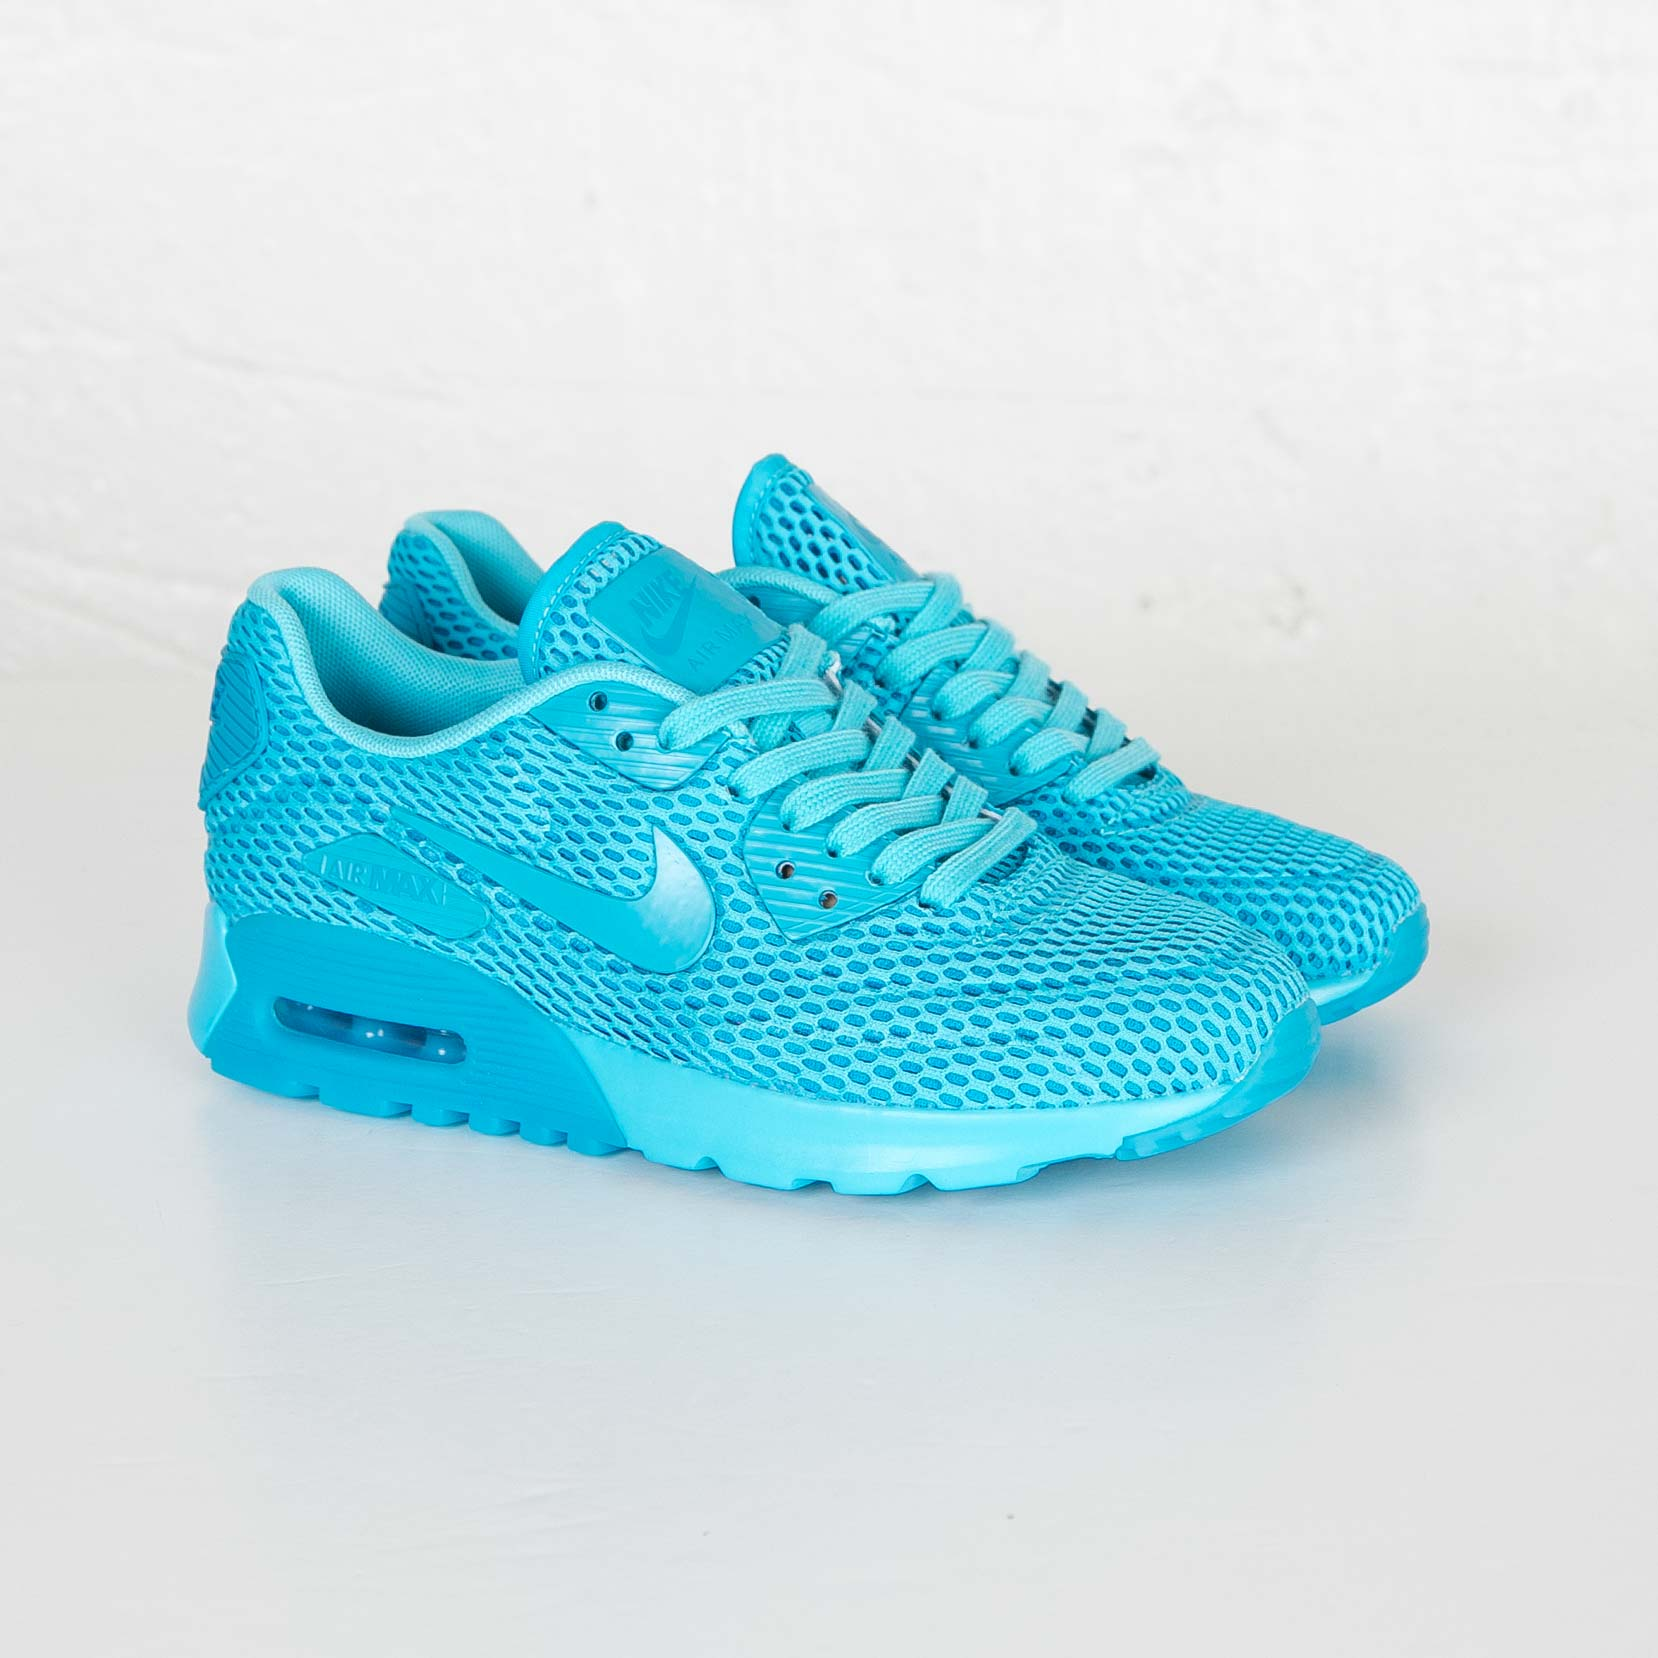 Nike W Air Max 90 Ultra BR 725061 401 Sneakersnstuff